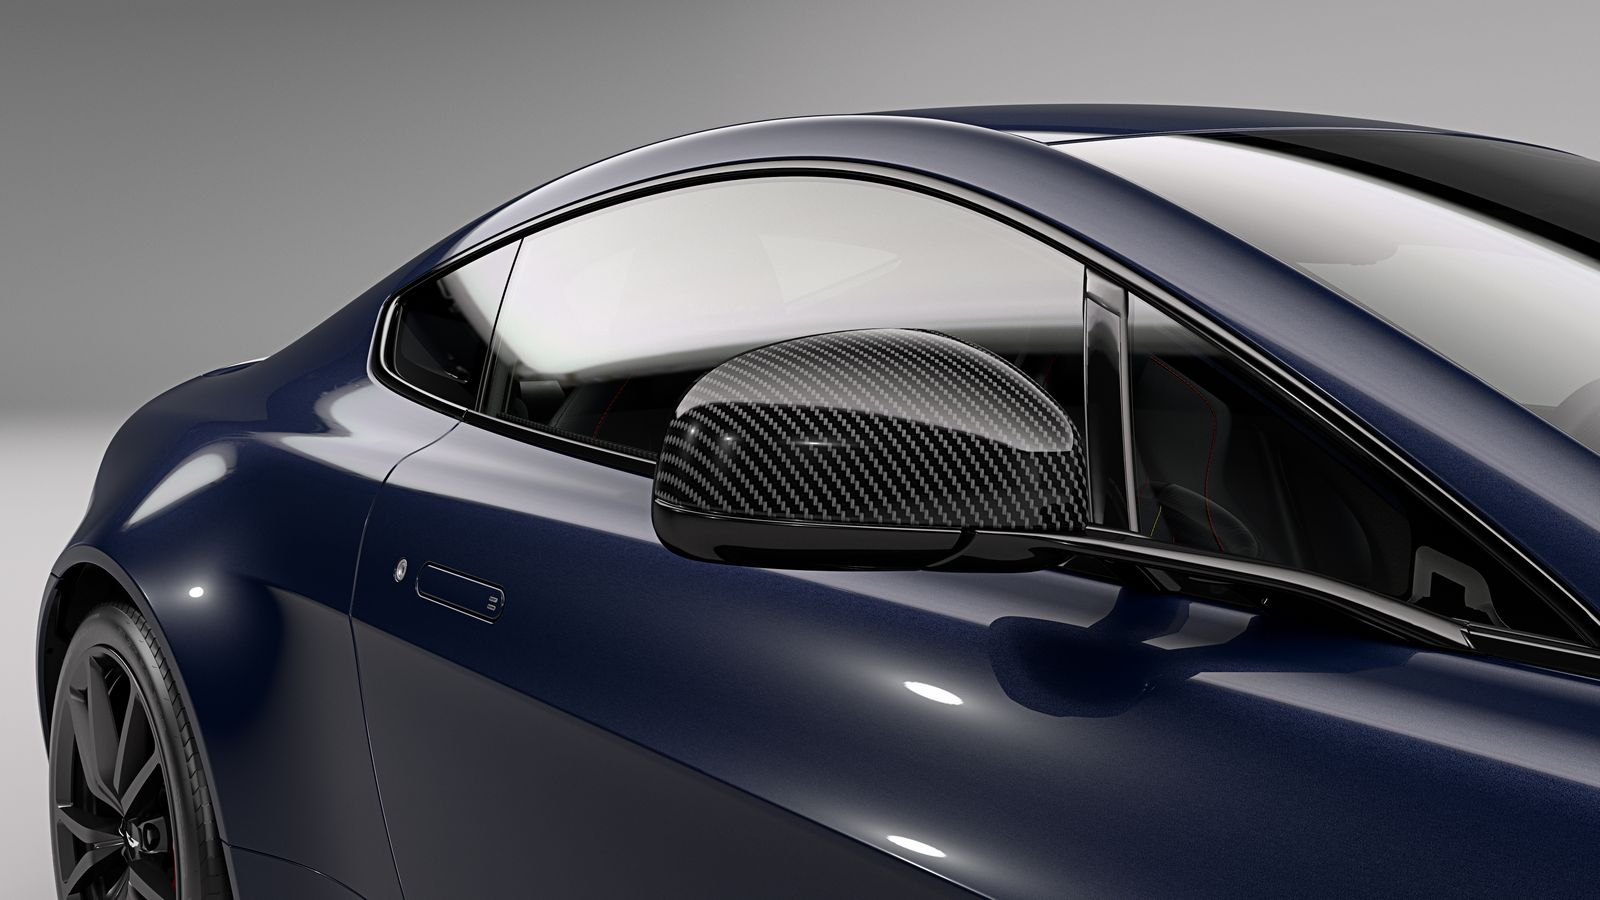 Aston Martin V8 and V12 Vantage Red Bull Racing Editions (16)